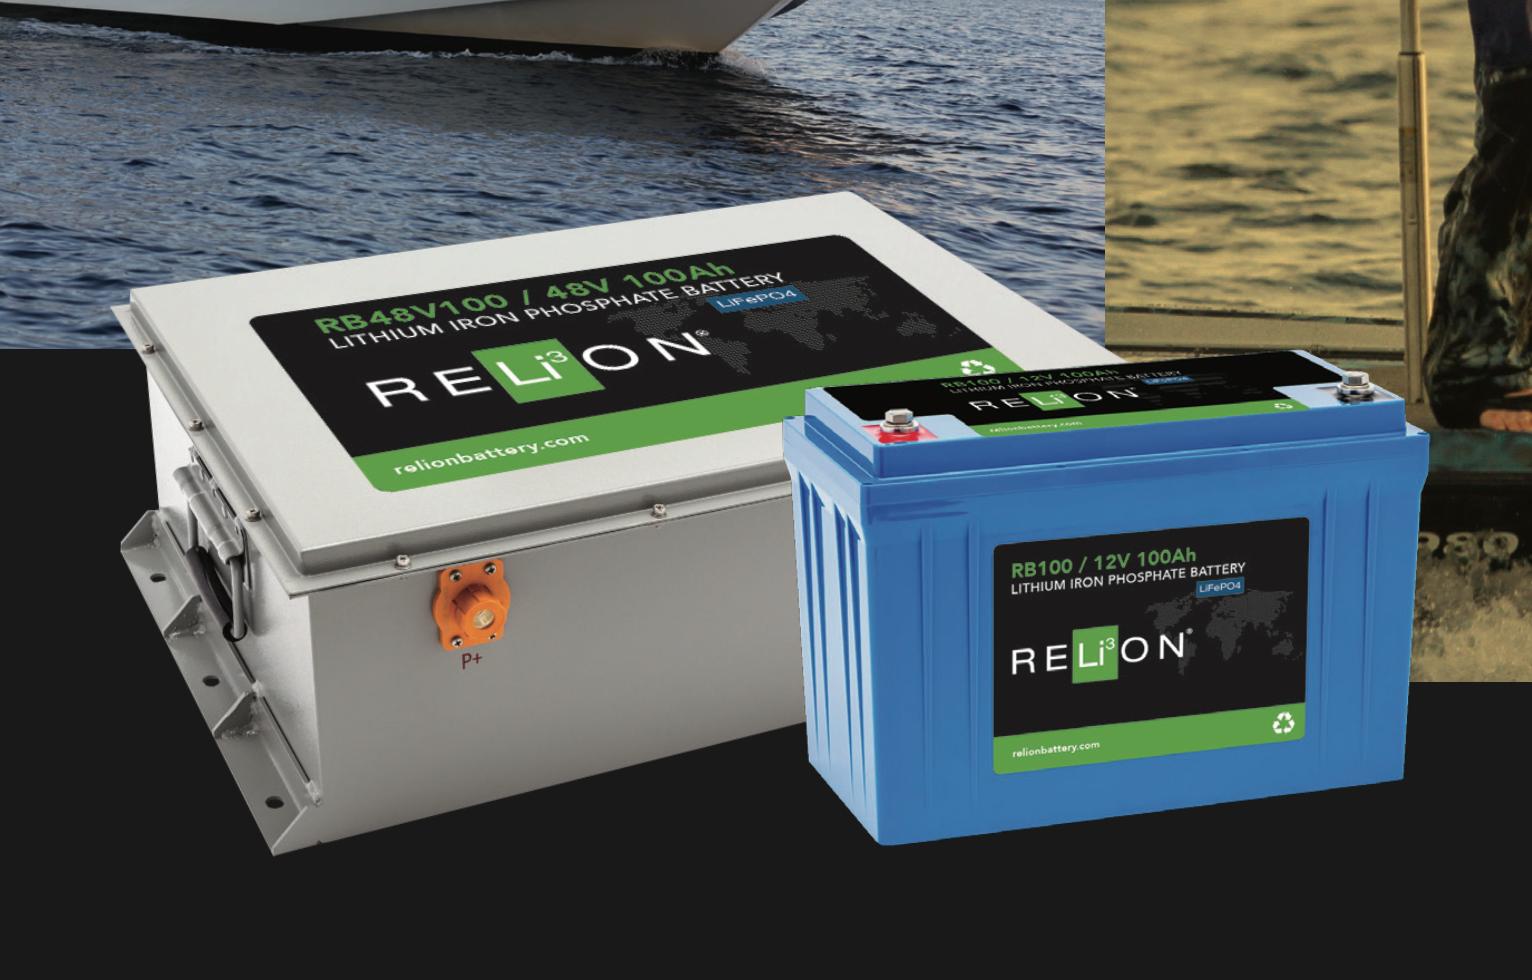 Relion Lithium Ion Marine Batteries Sailing Gear Boat Stuff Sailing